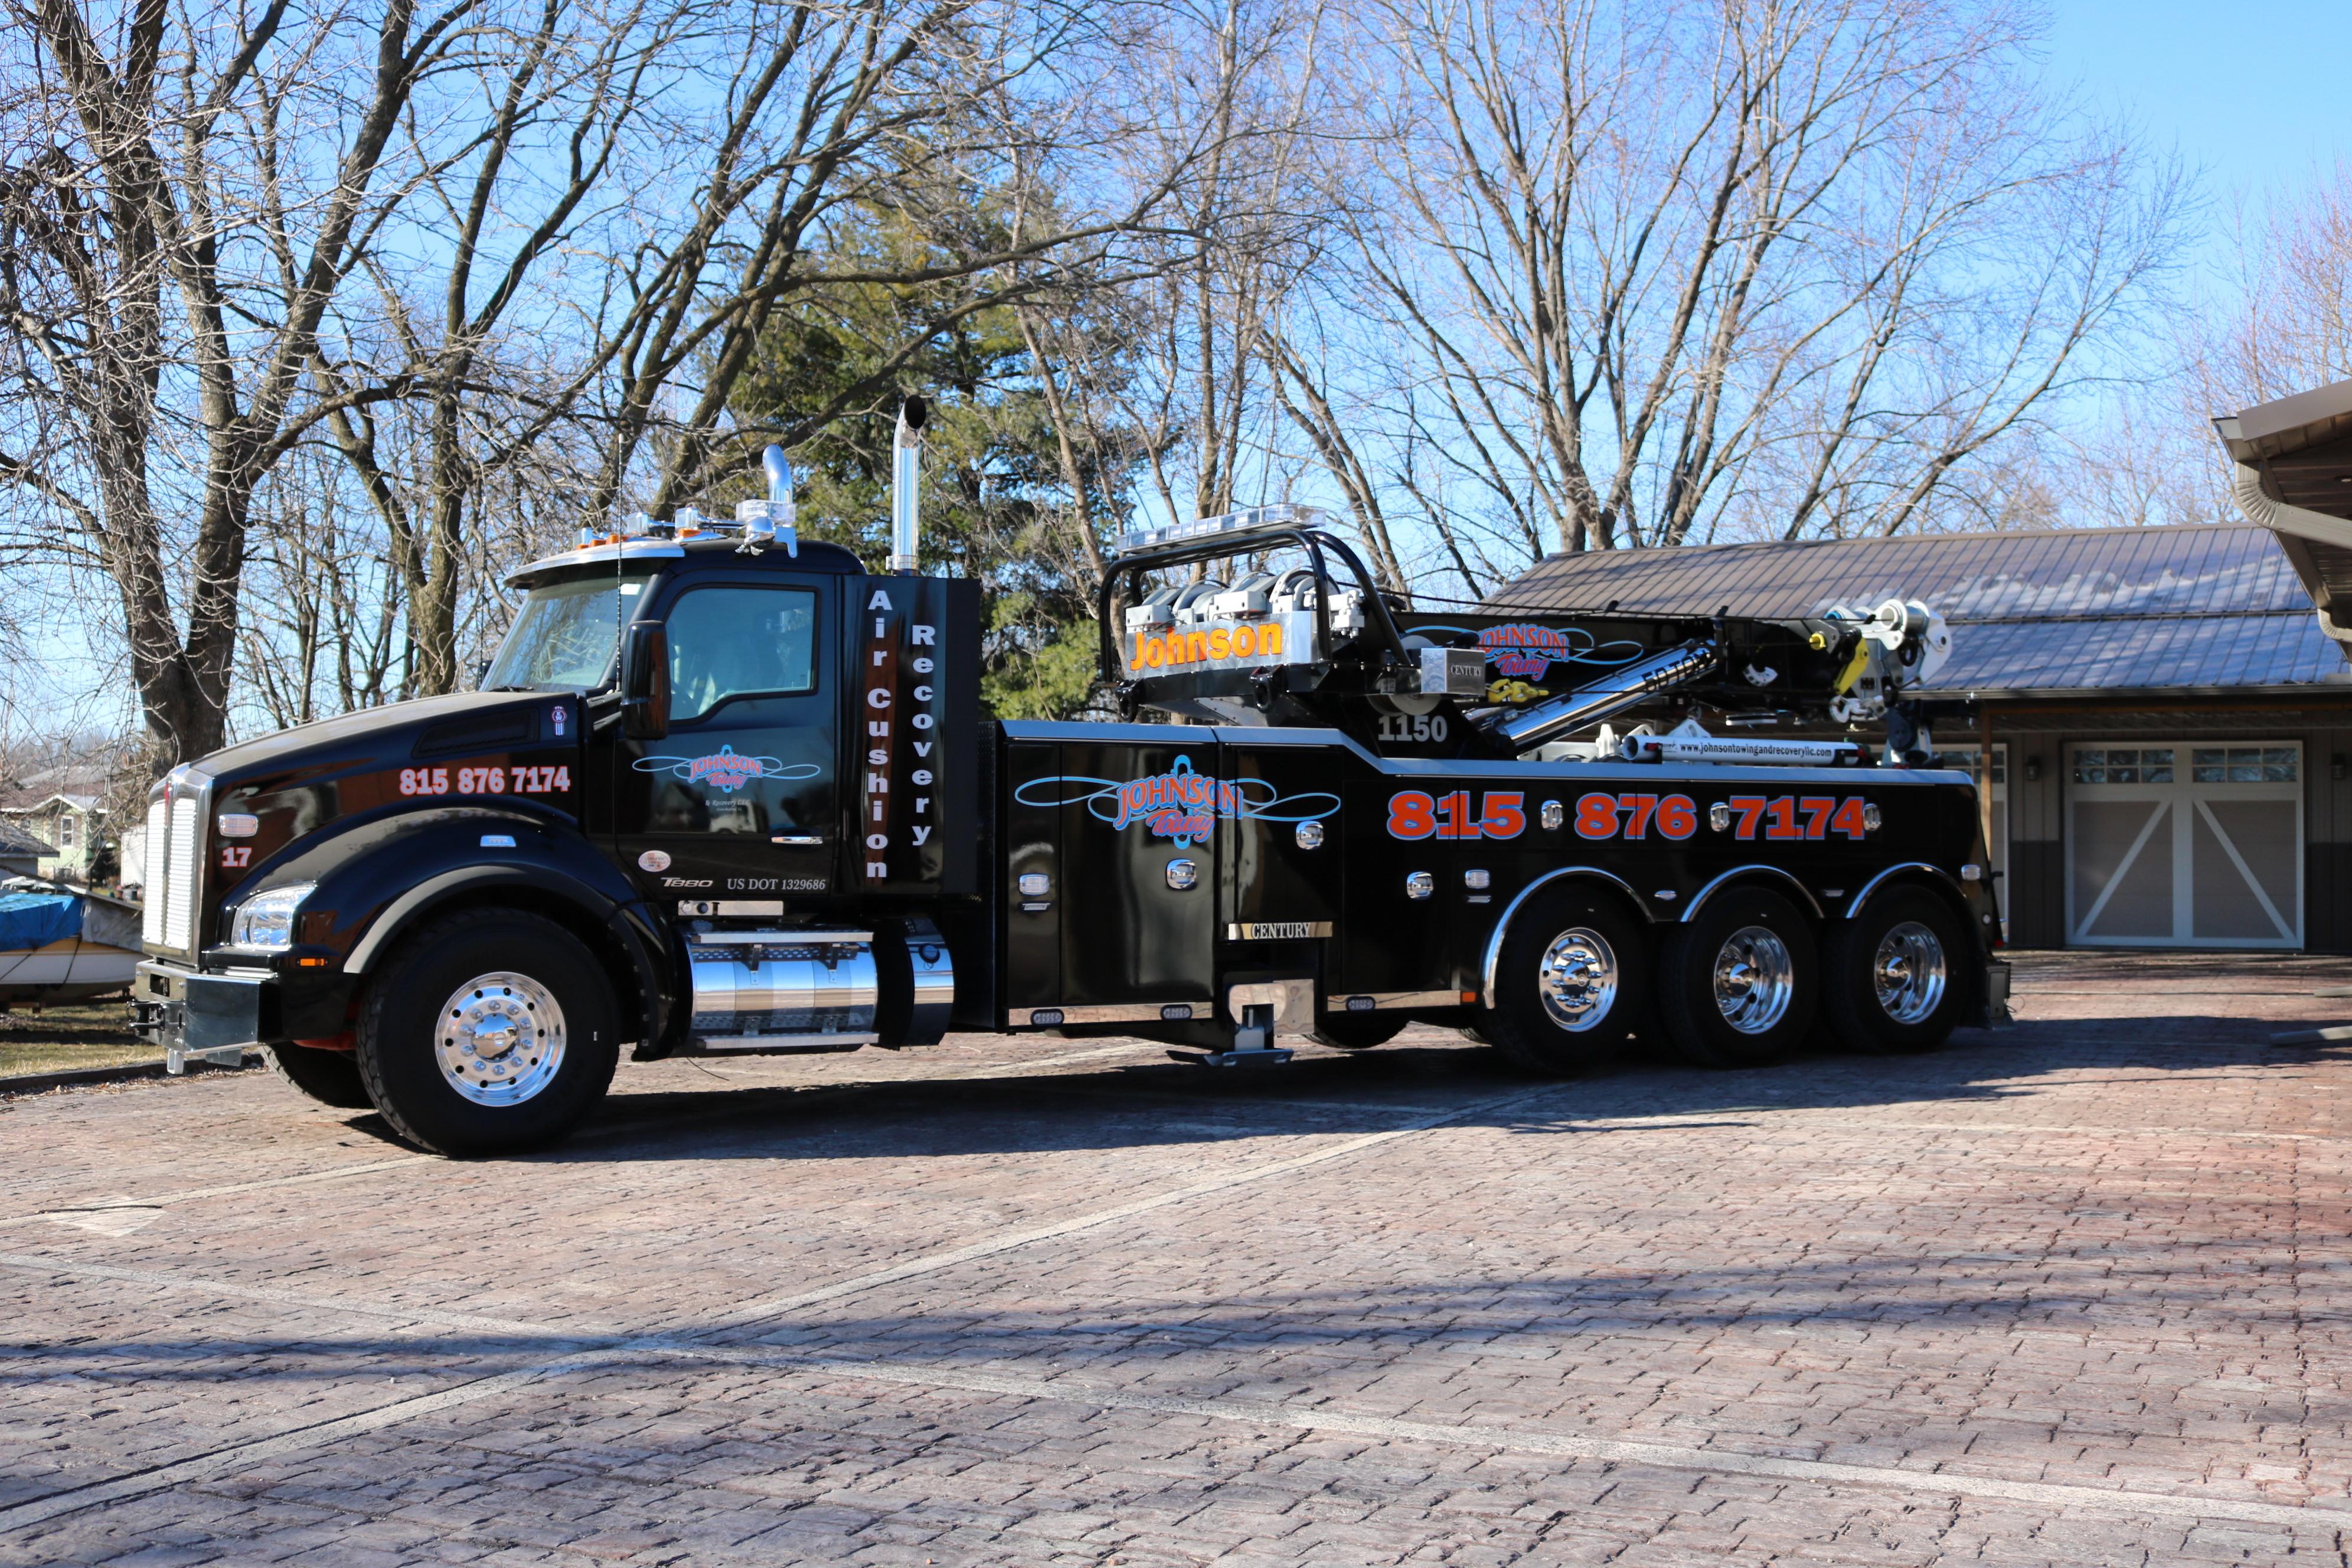 Tire Shops Open On Sunday >> Johnson Towing & Recovery Princeton, Princeton Illinois (IL) - LocalDatabase.com